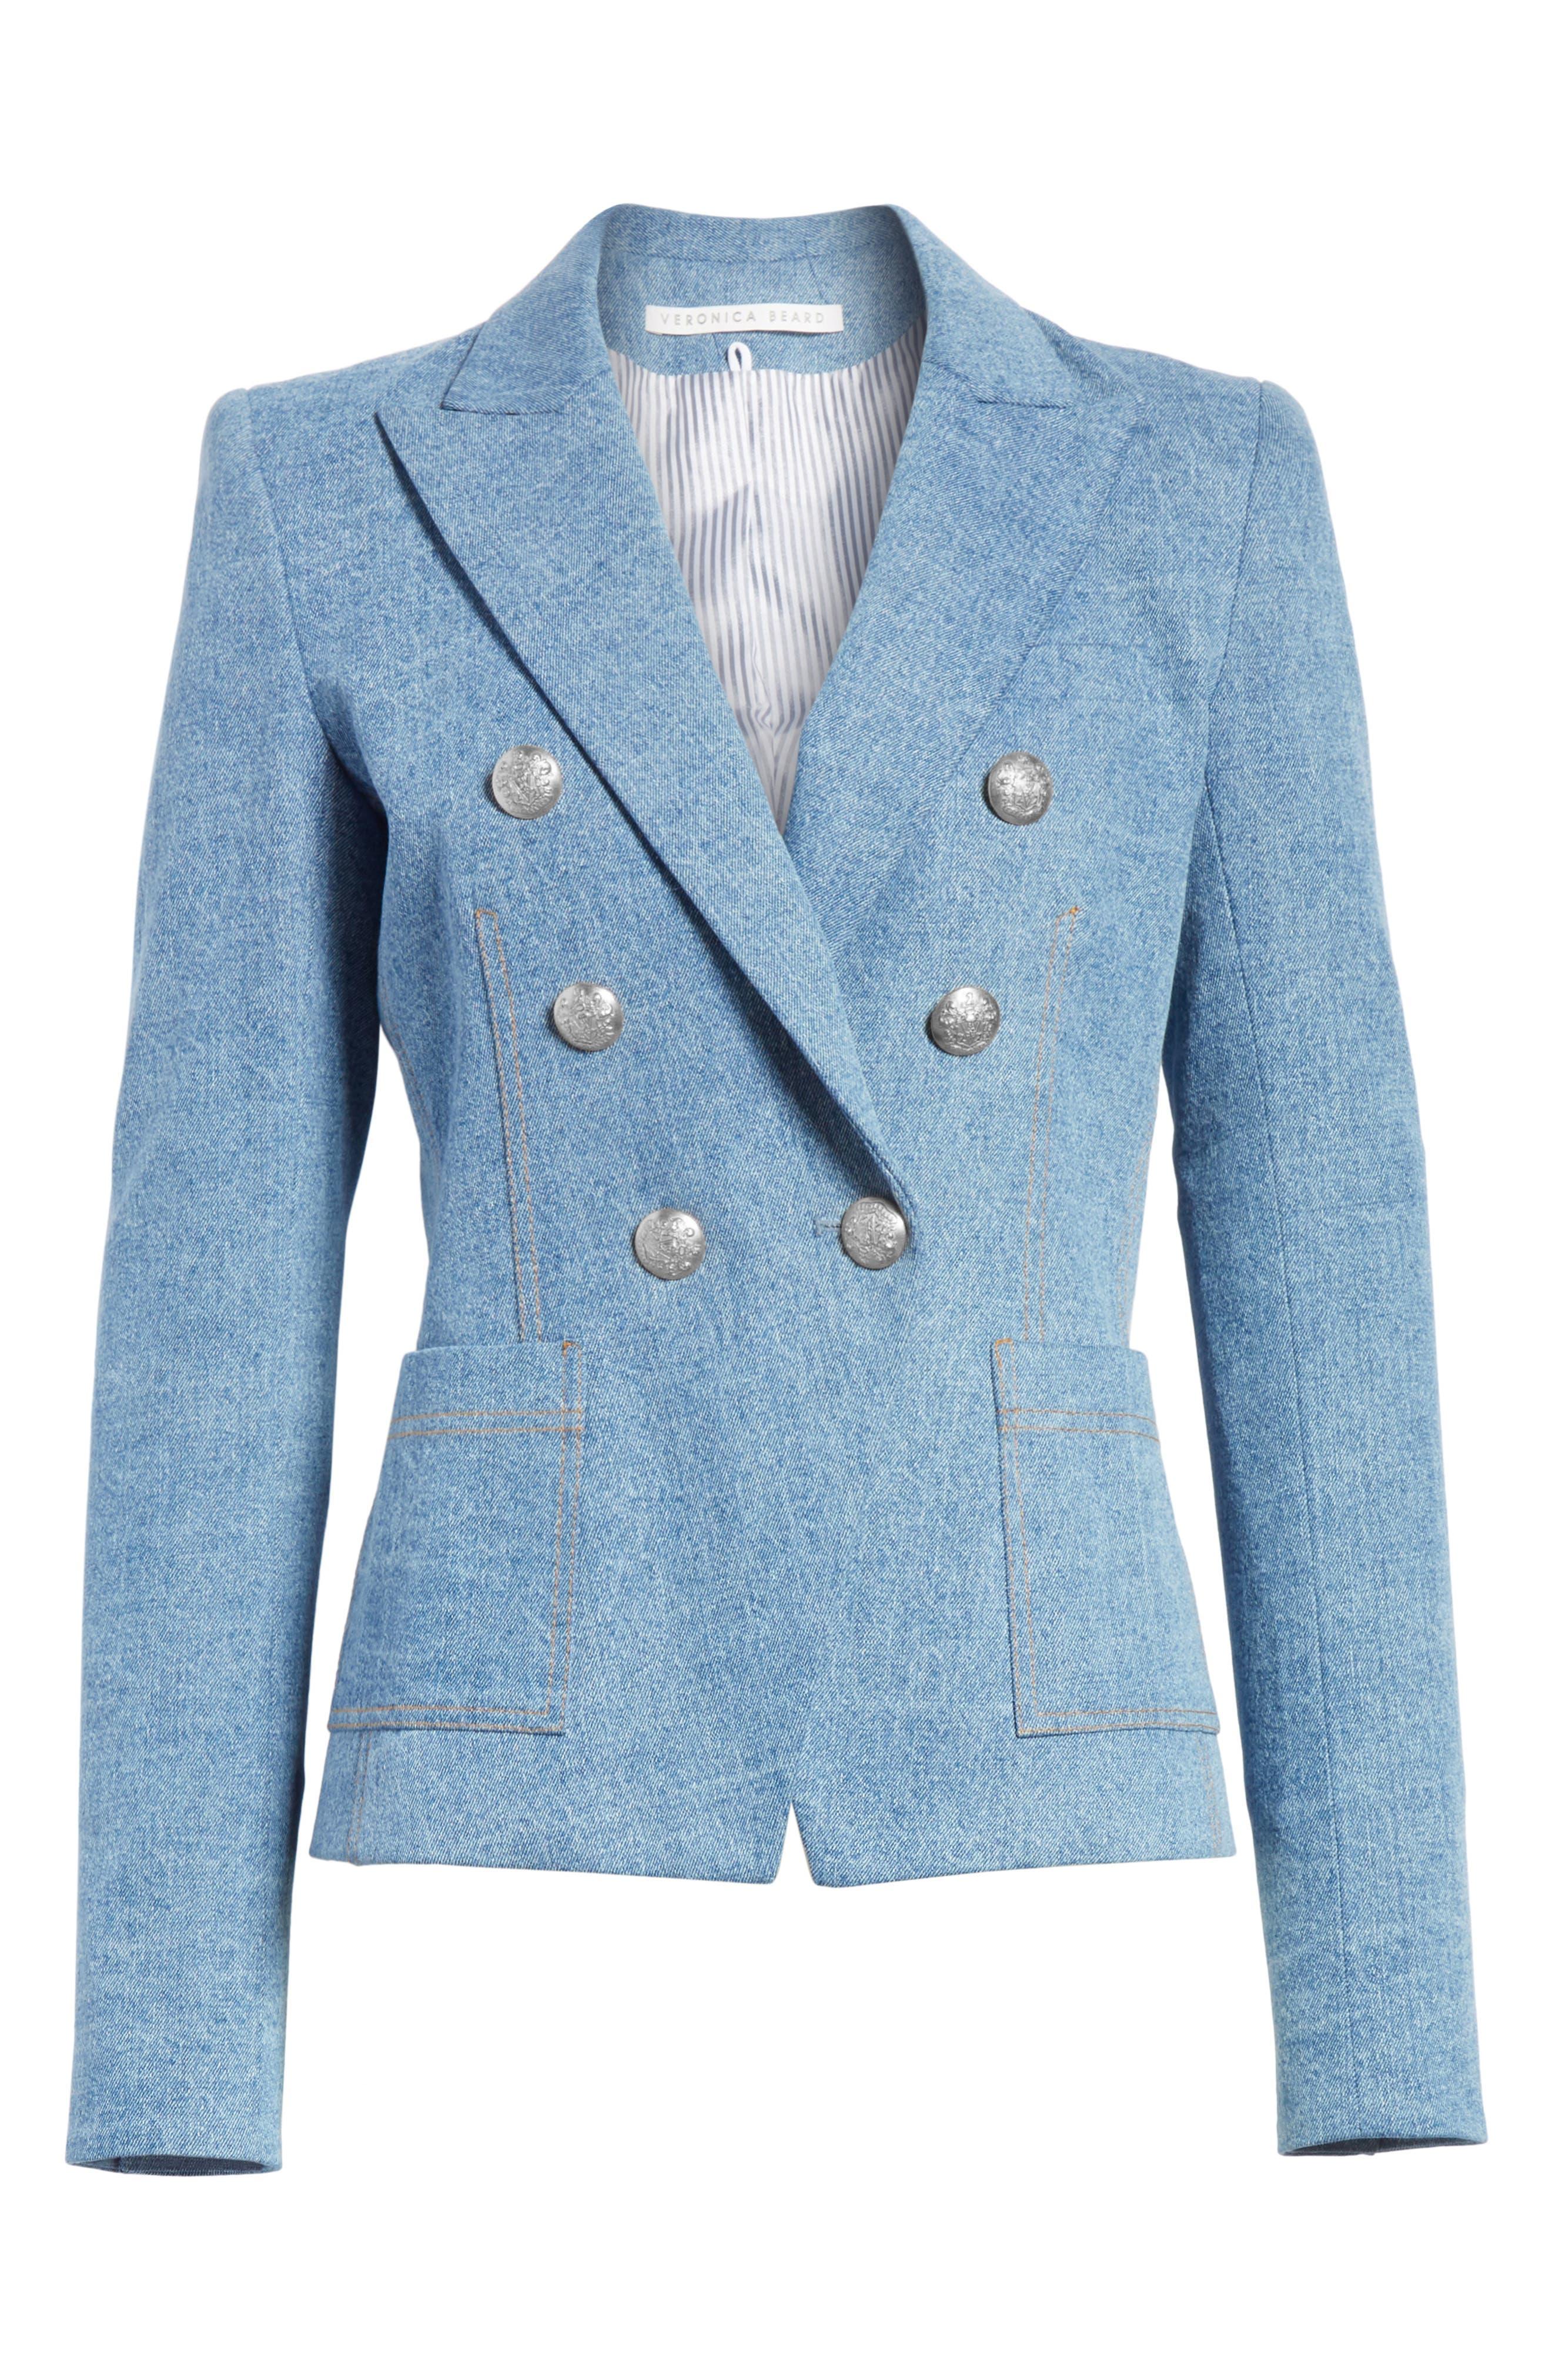 VERONICA BEARD, Caden Denim Dickey Jacket, Main thumbnail 1, color, MID BLUE